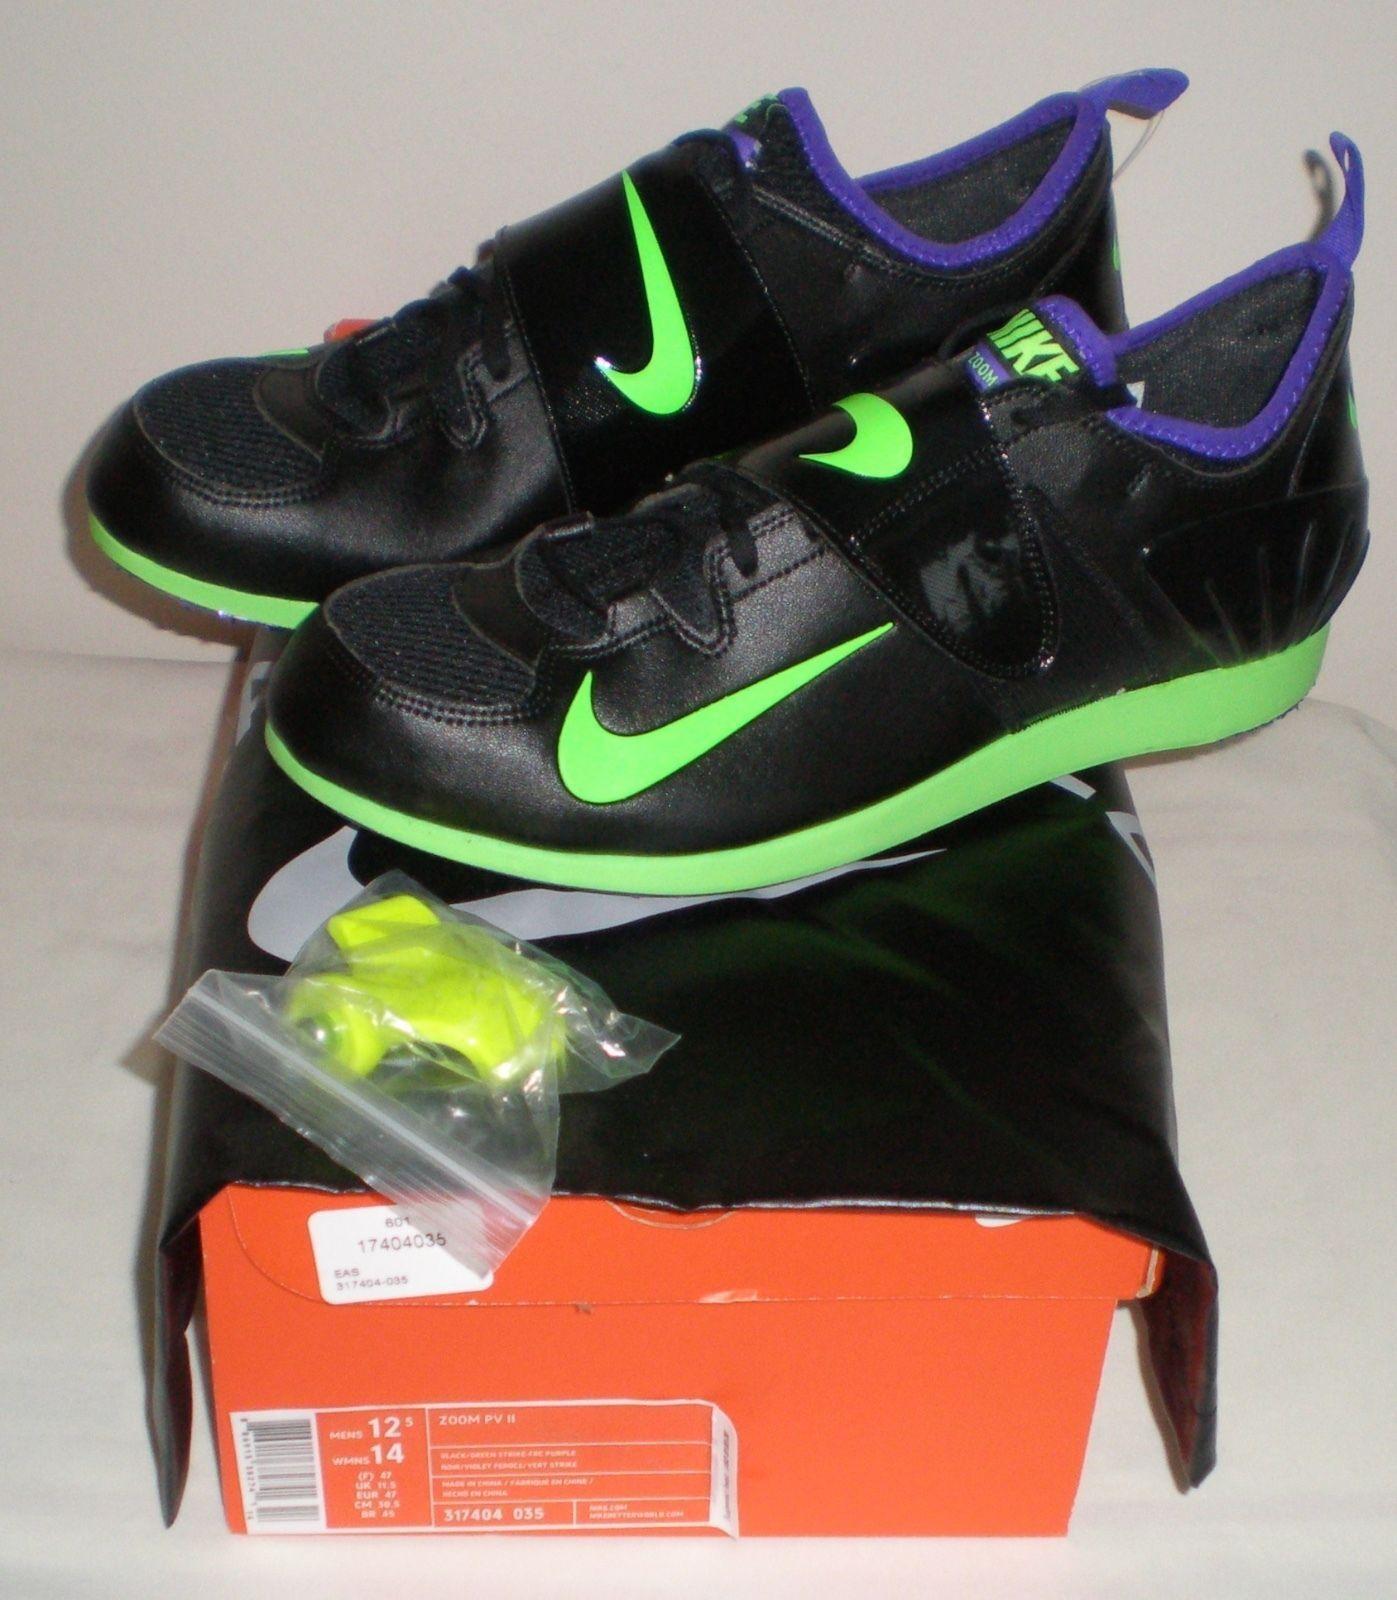 120 Men NIKE ZOOM PV II 2 Track POLE VAULT shoes Spikes 317404 035 BLACK 12.5